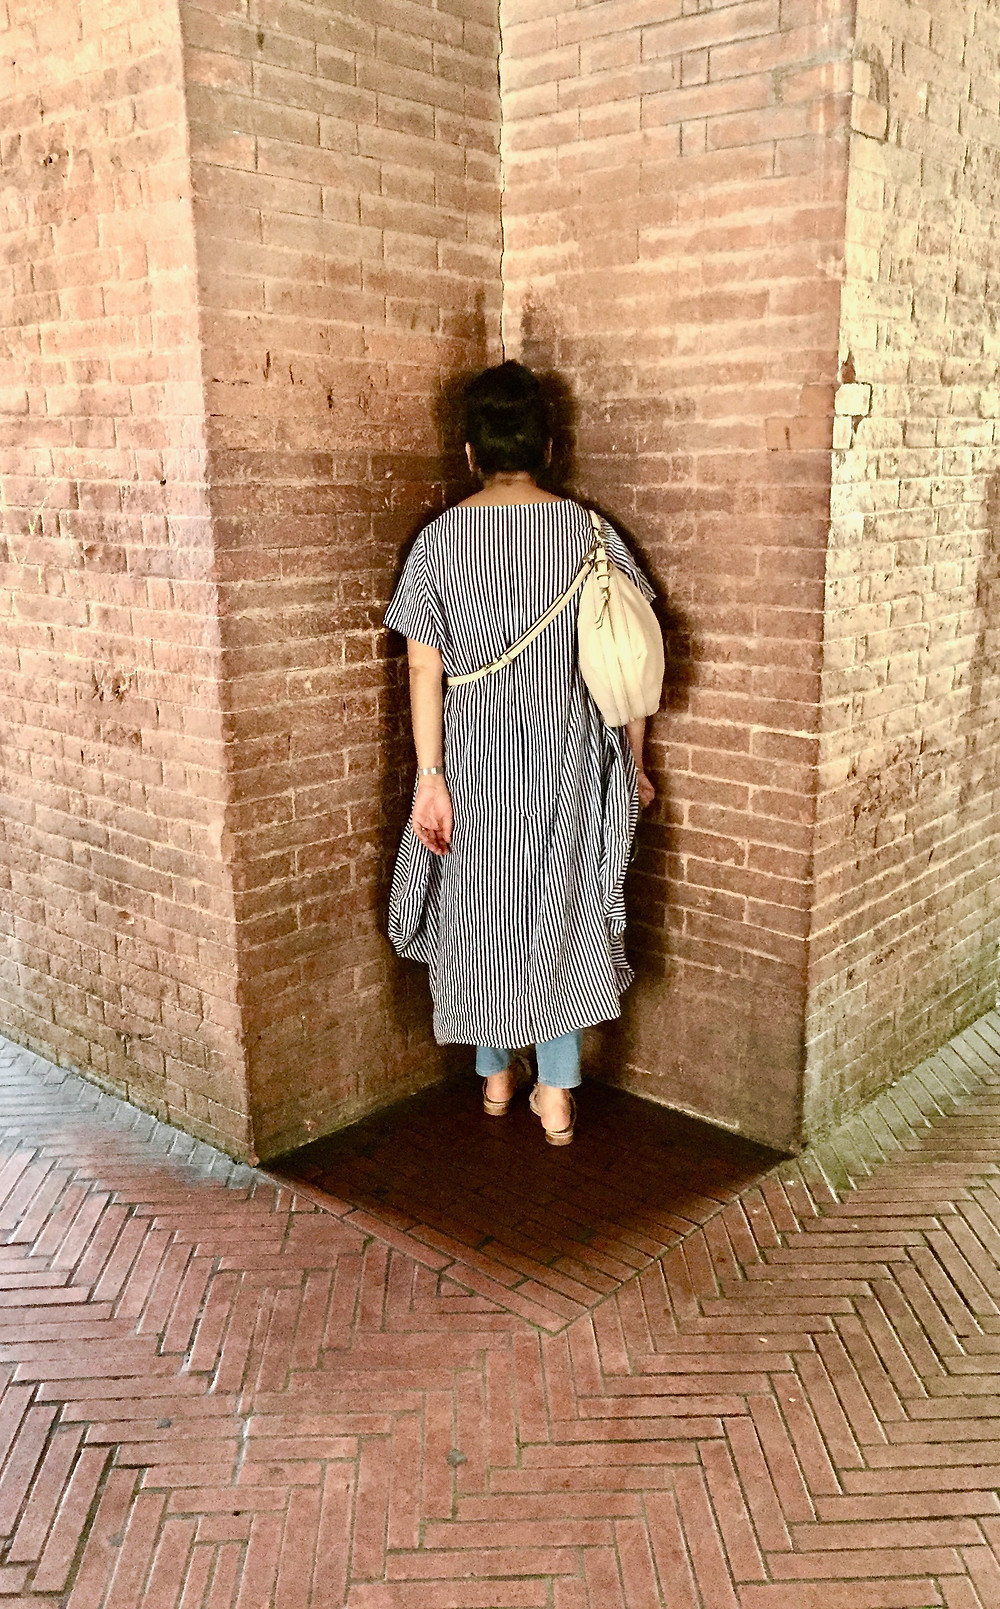 Bologna's Whispering Wall.